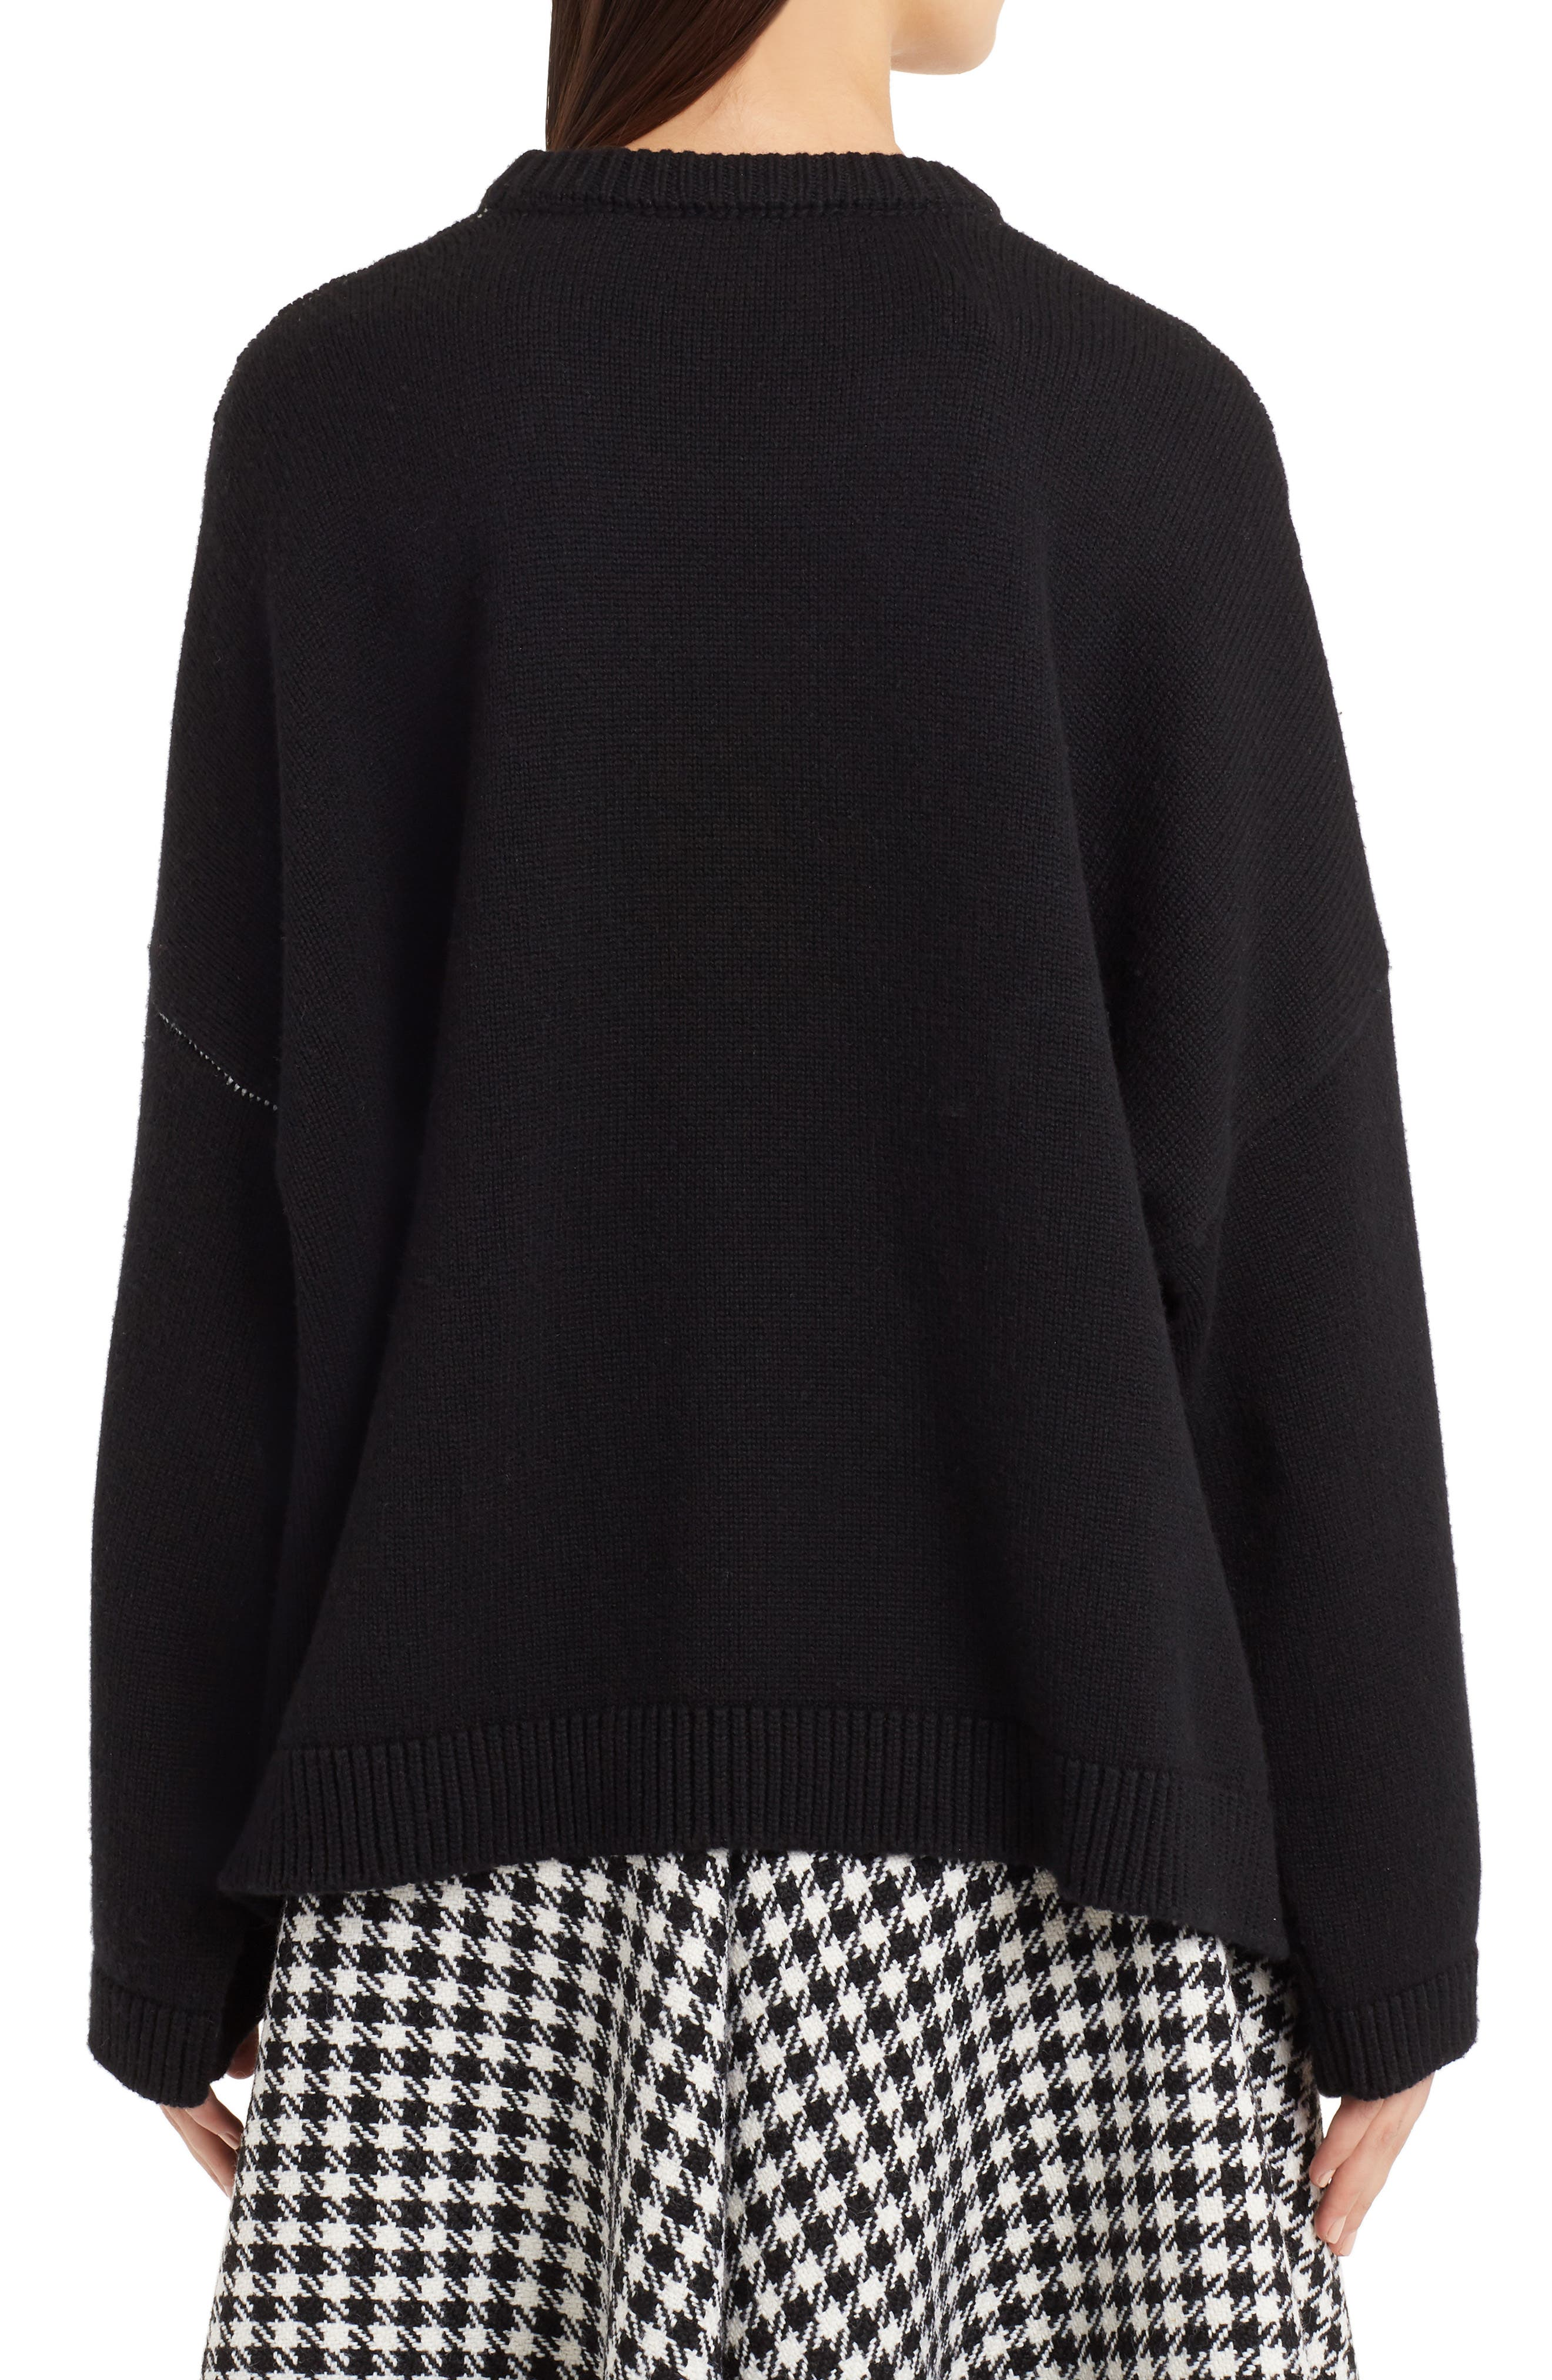 DOLCE&GABBANA,                             Intarsia Logo Cashmere Sweater,                             Alternate thumbnail 2, color,                             BLACK